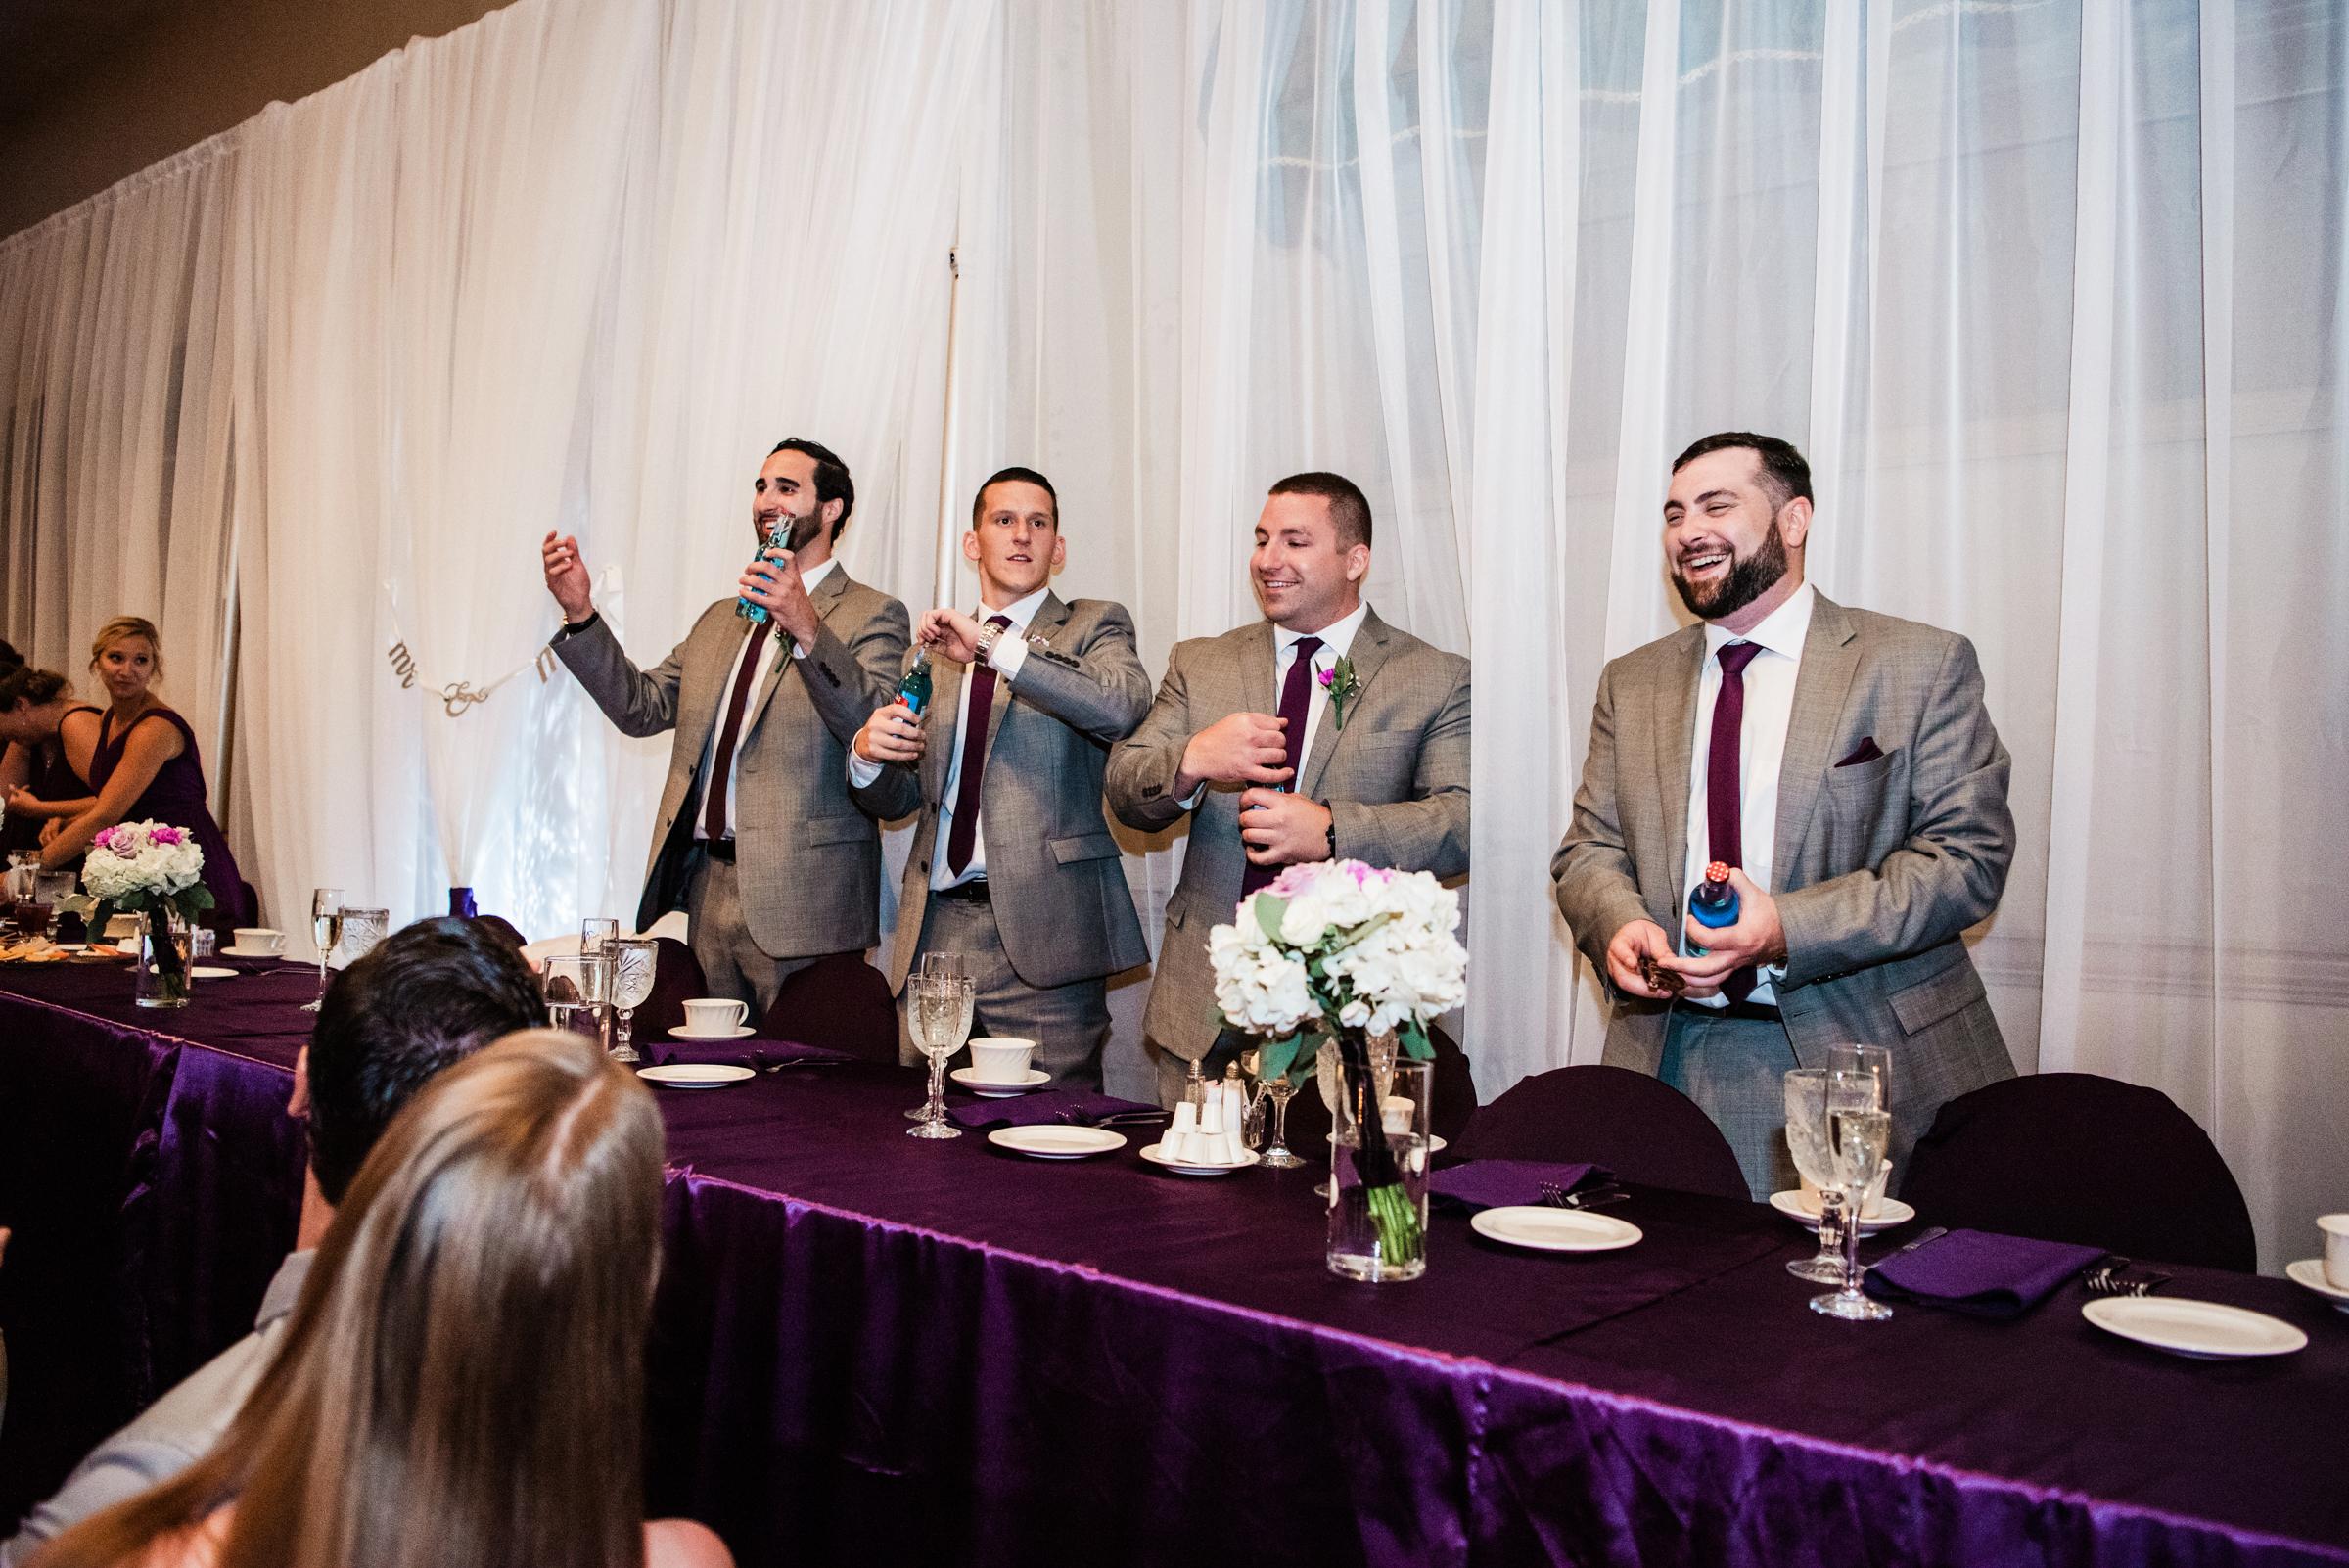 Historic_Old_St_Johns_Church_Valentinos_Banquet_Hall_Central_NY_Wedding_JILL_STUDIO_Rochester_NY_Photographer_DSC_6721.jpg